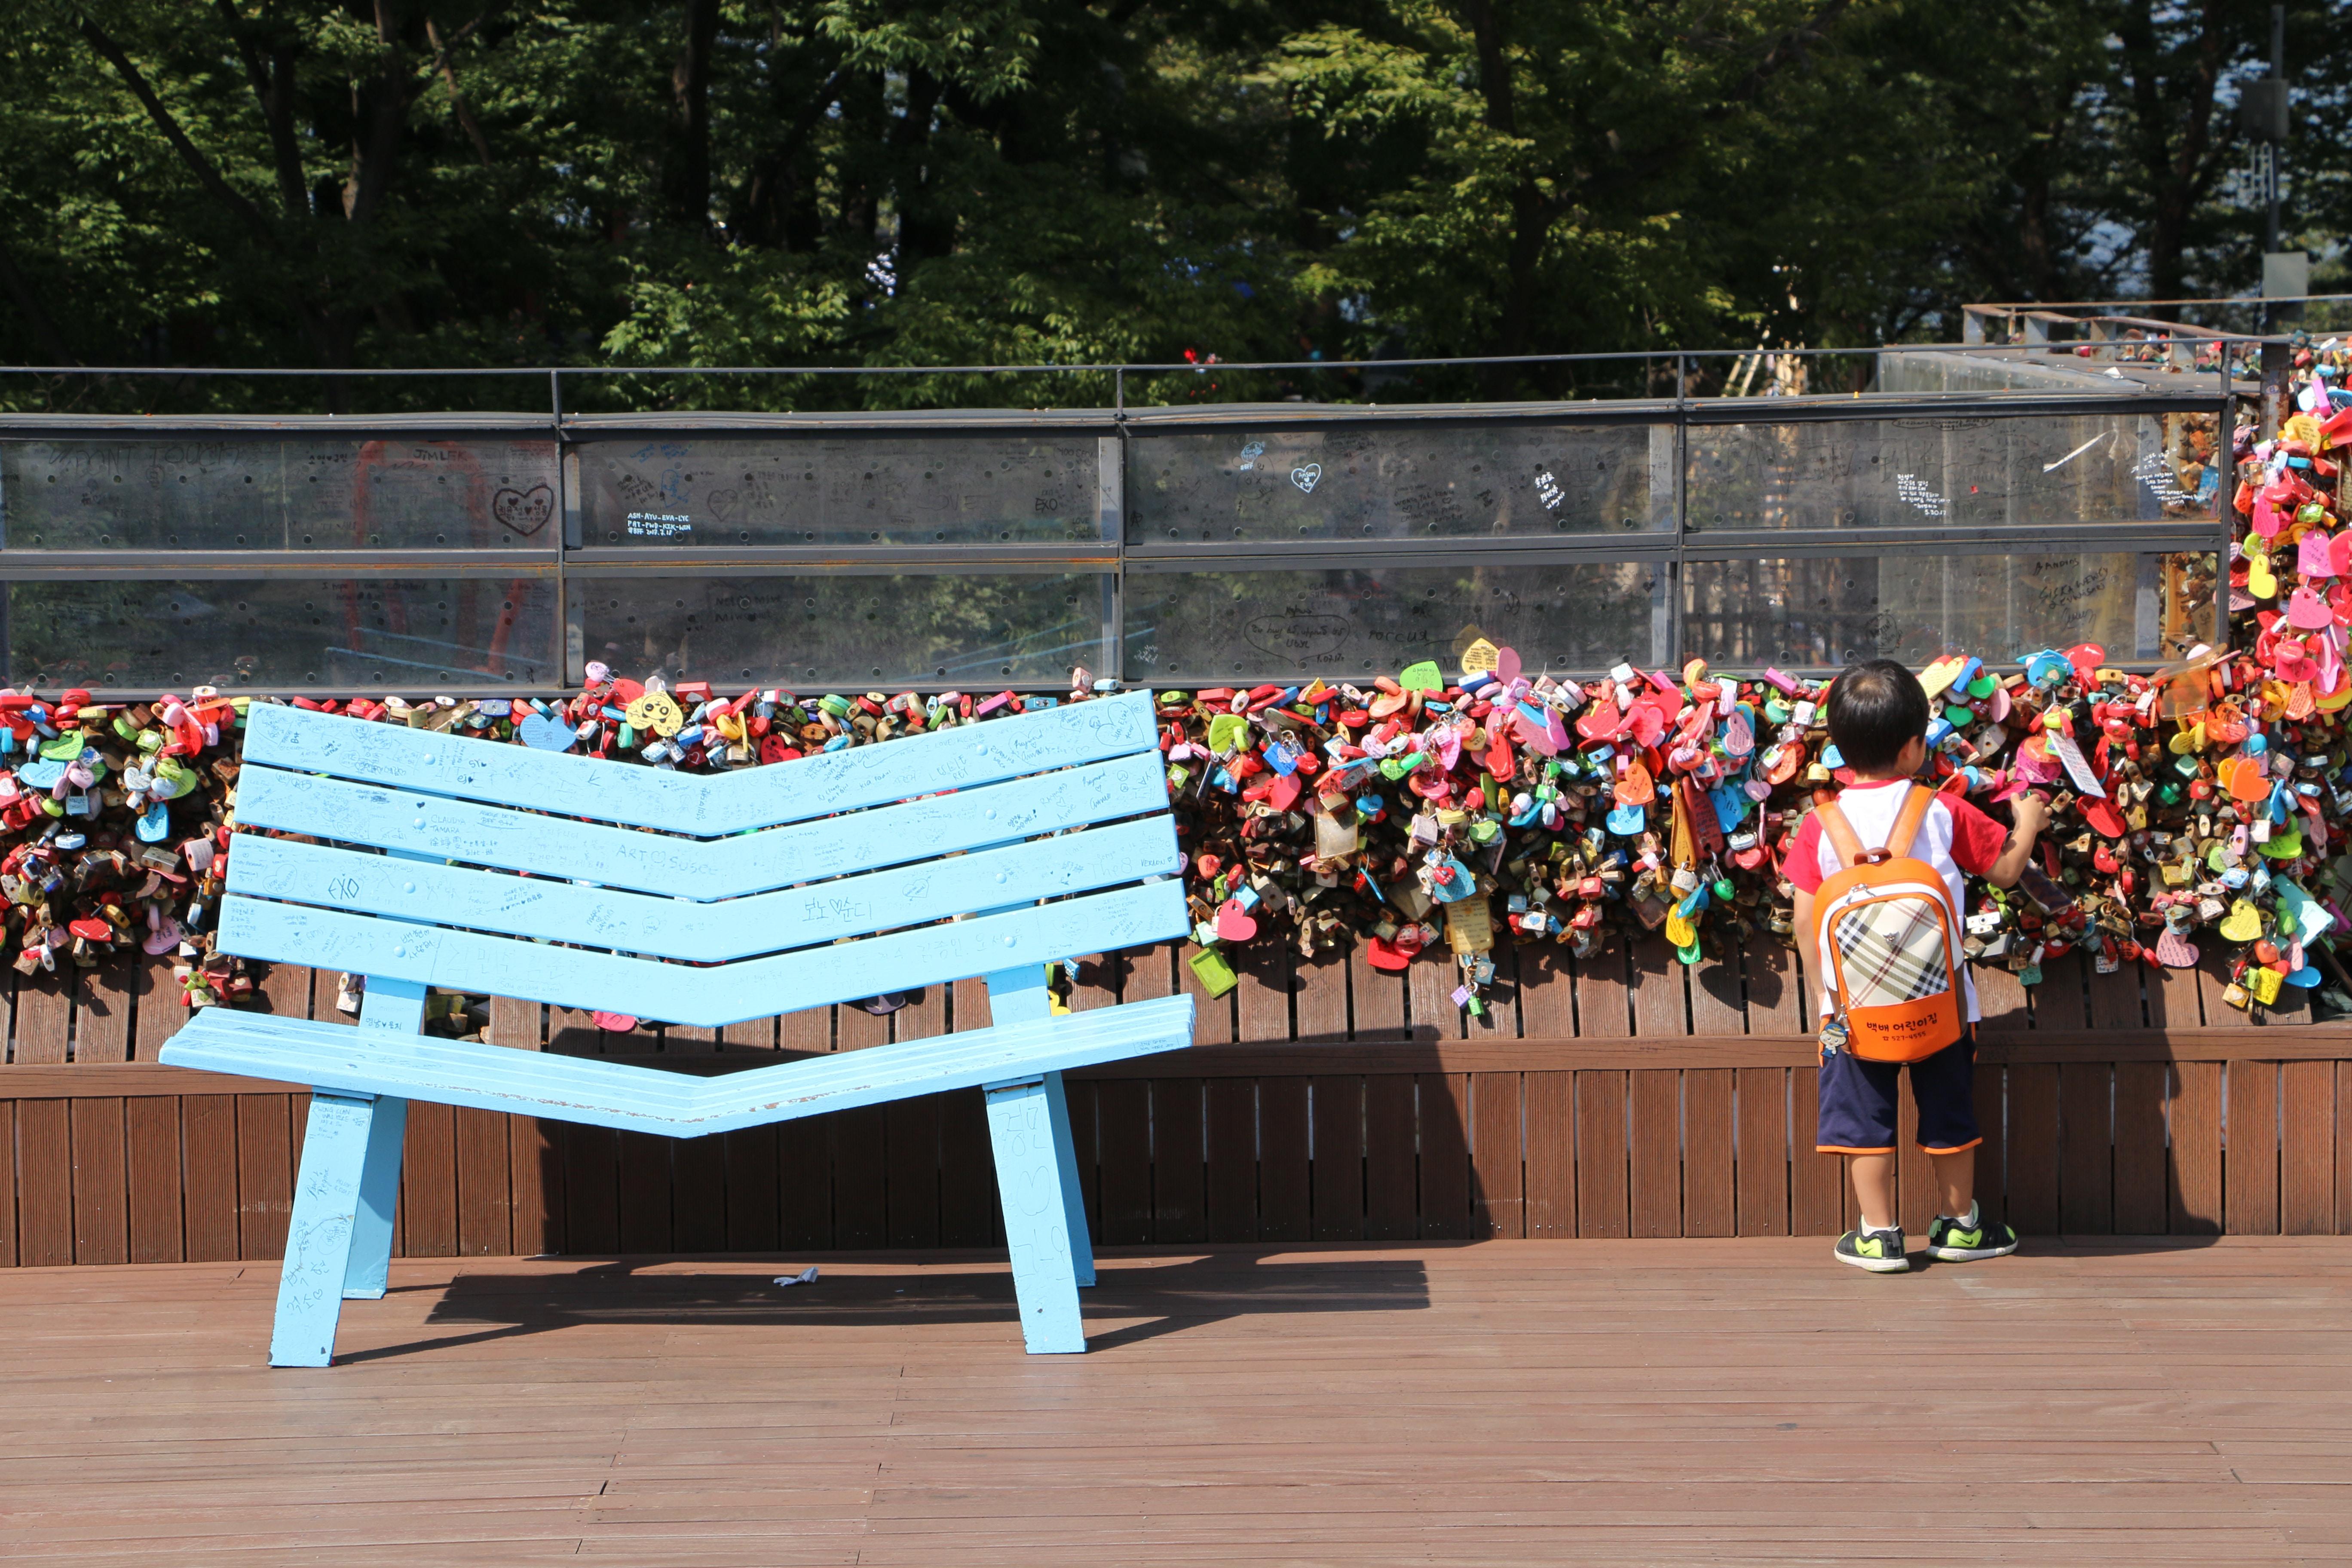 toddler standing near blue wooden bench